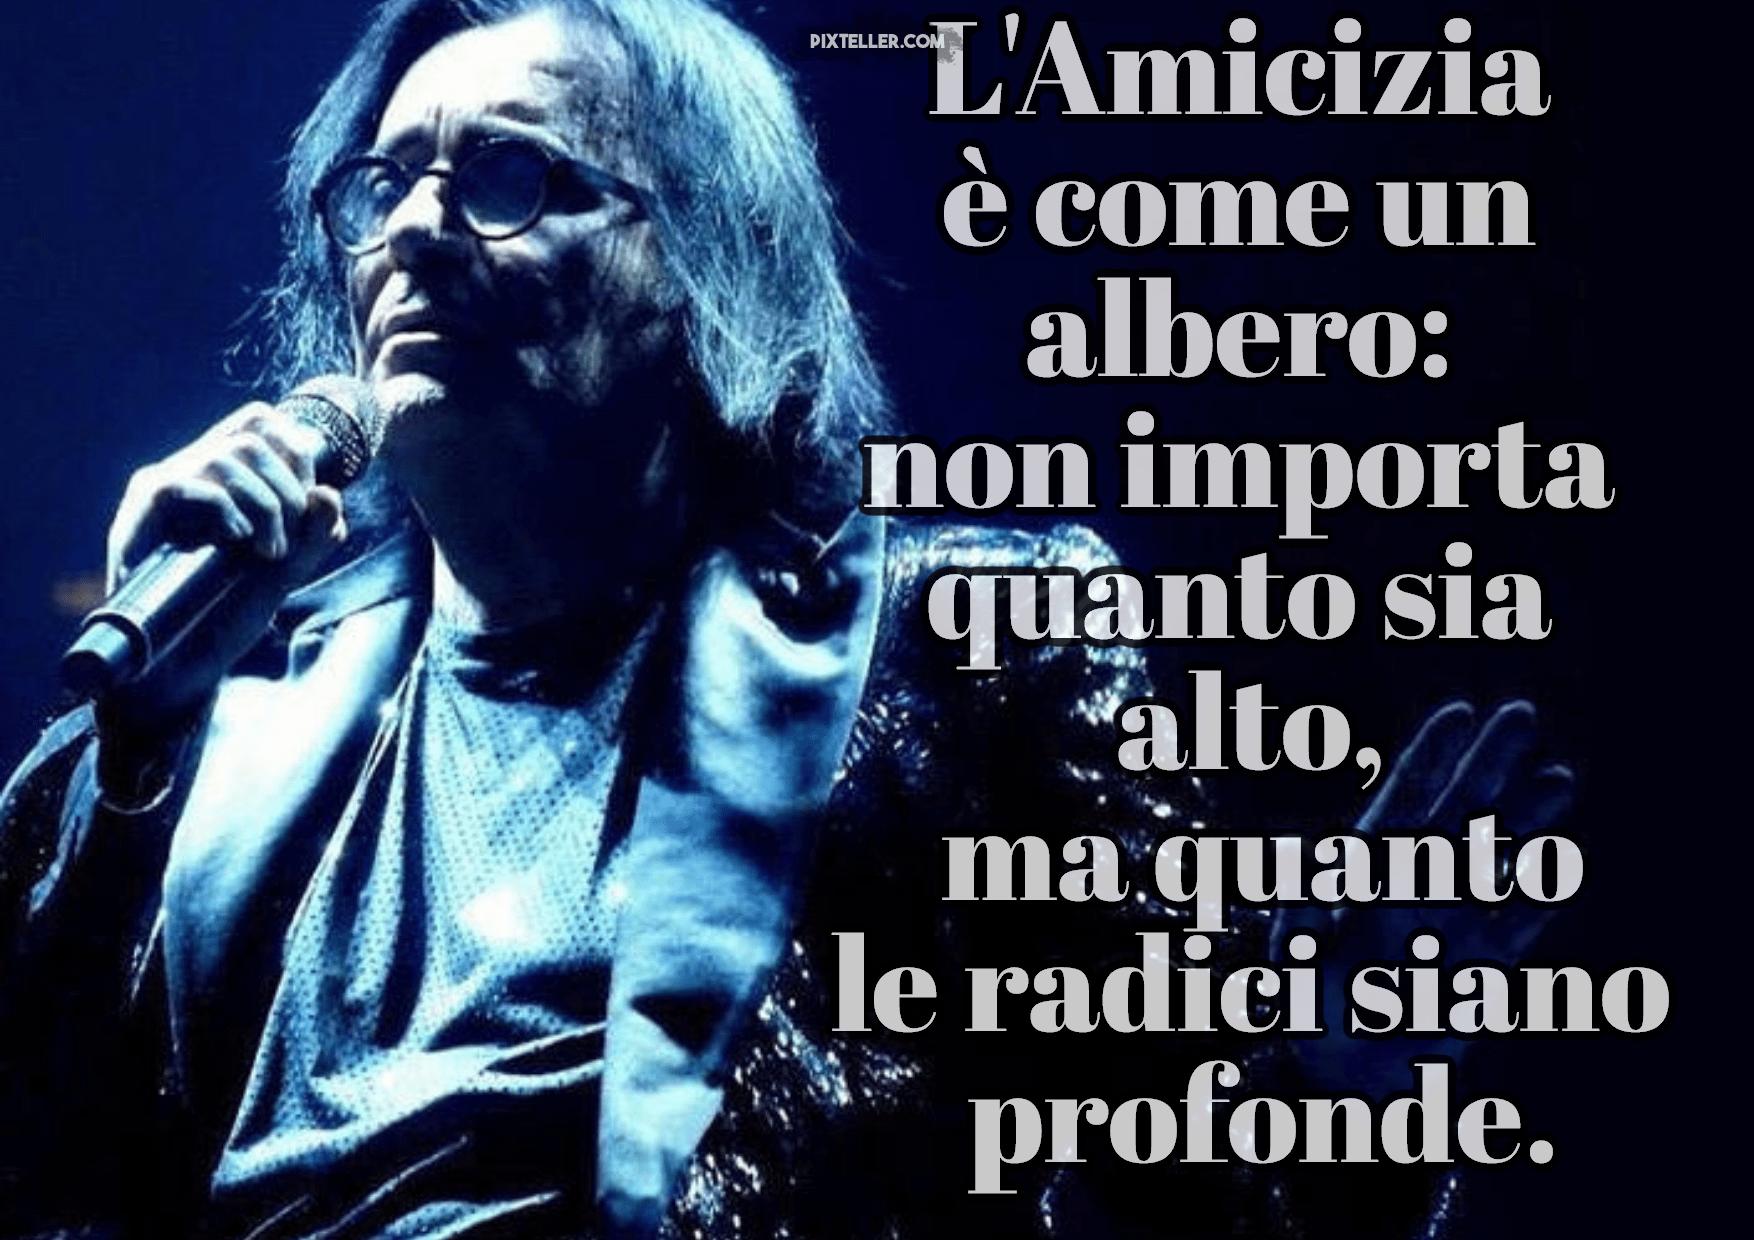 Poster,                Text,                Quote,                Mockup,                Inspiration,                Life,                Photo,                Image,                White,                Black,                 Free Image